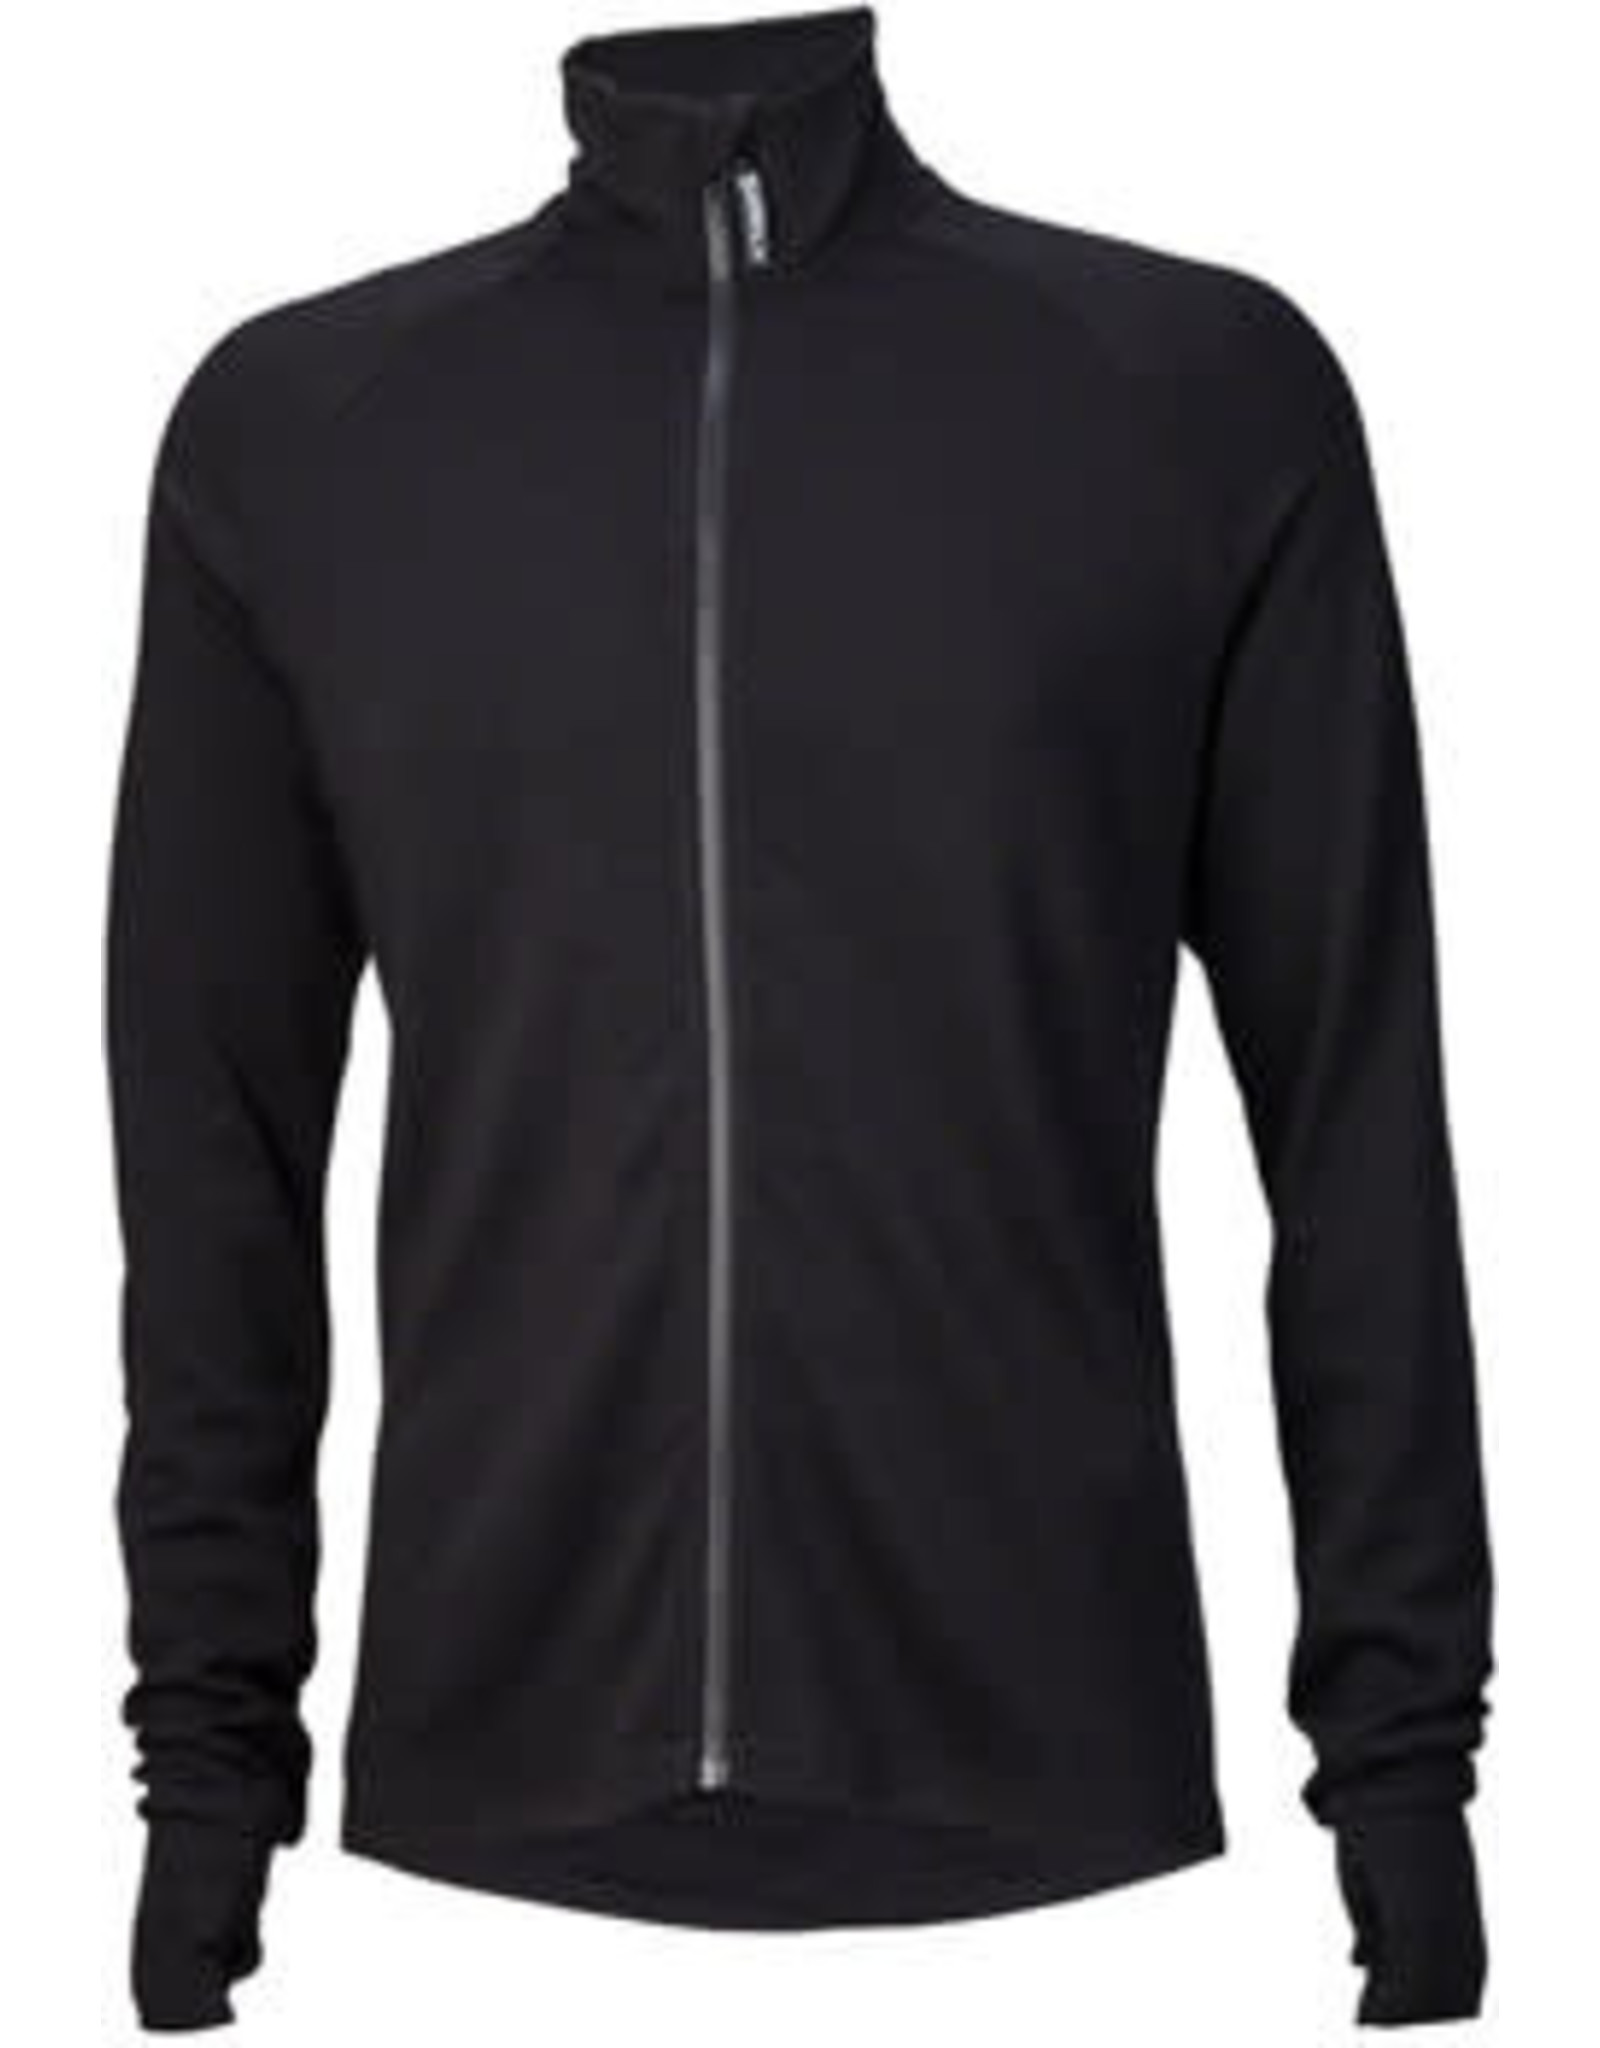 Surly Surly Merino Wool Men's Long Sleeve Jersey: Black XL